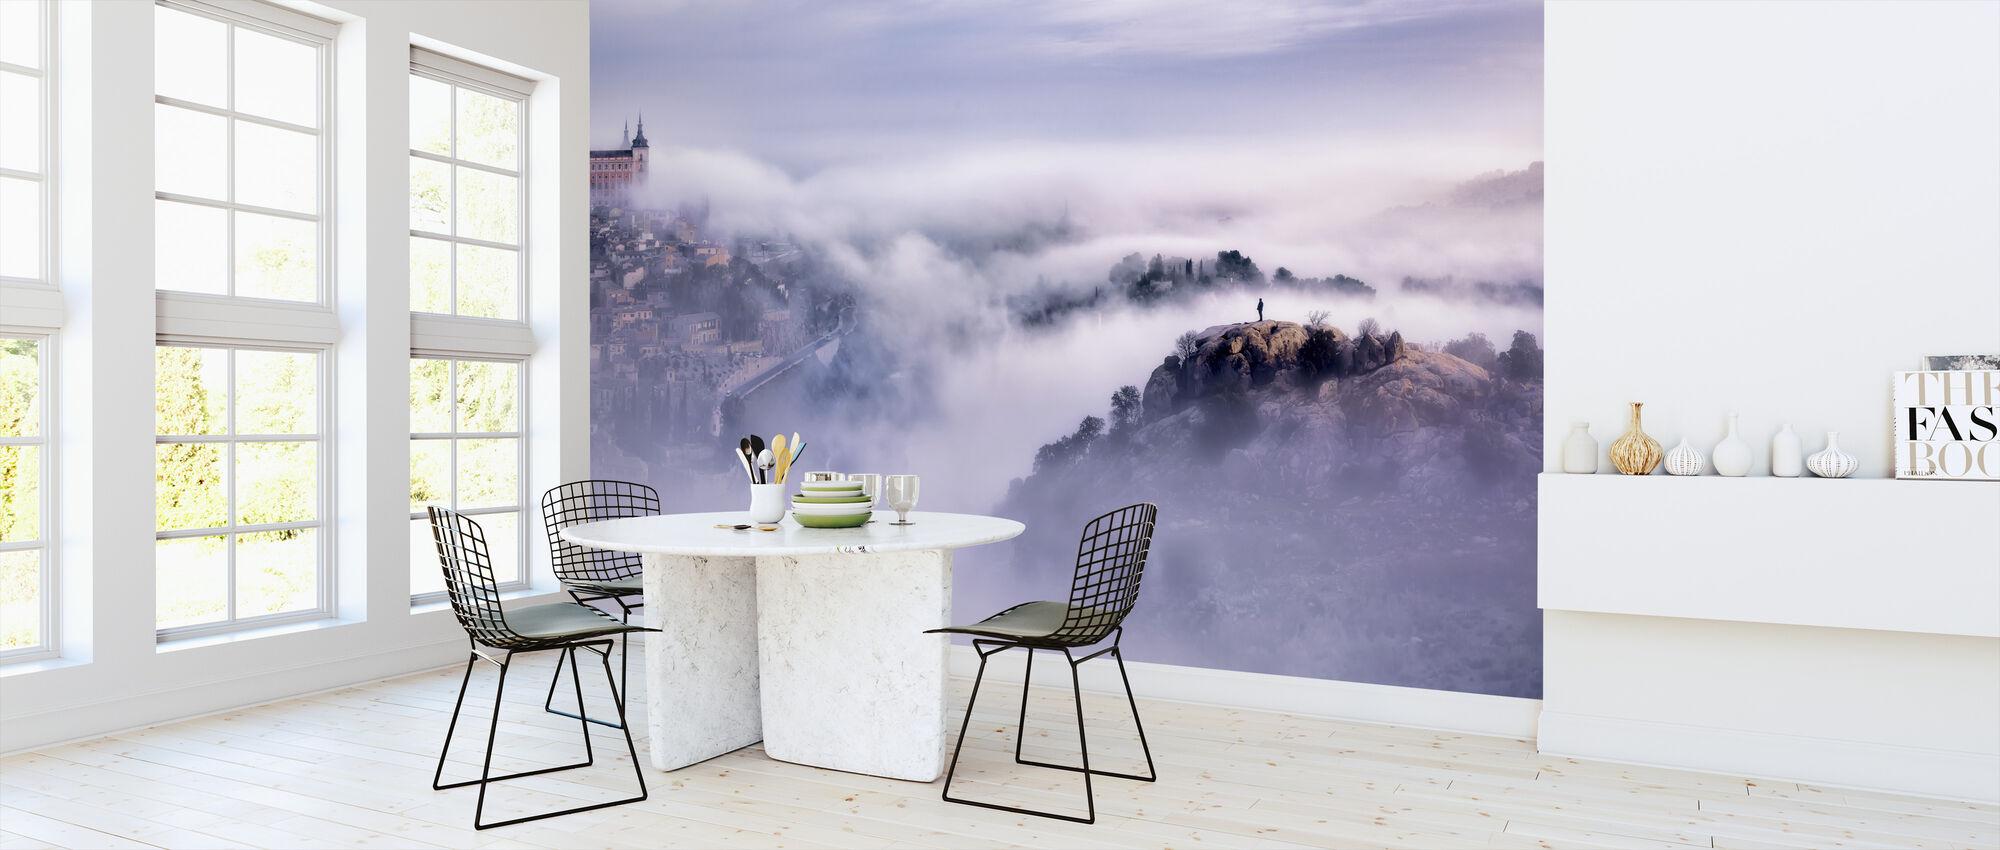 Toledo City Foggy Morning - Wallpaper - Kitchen